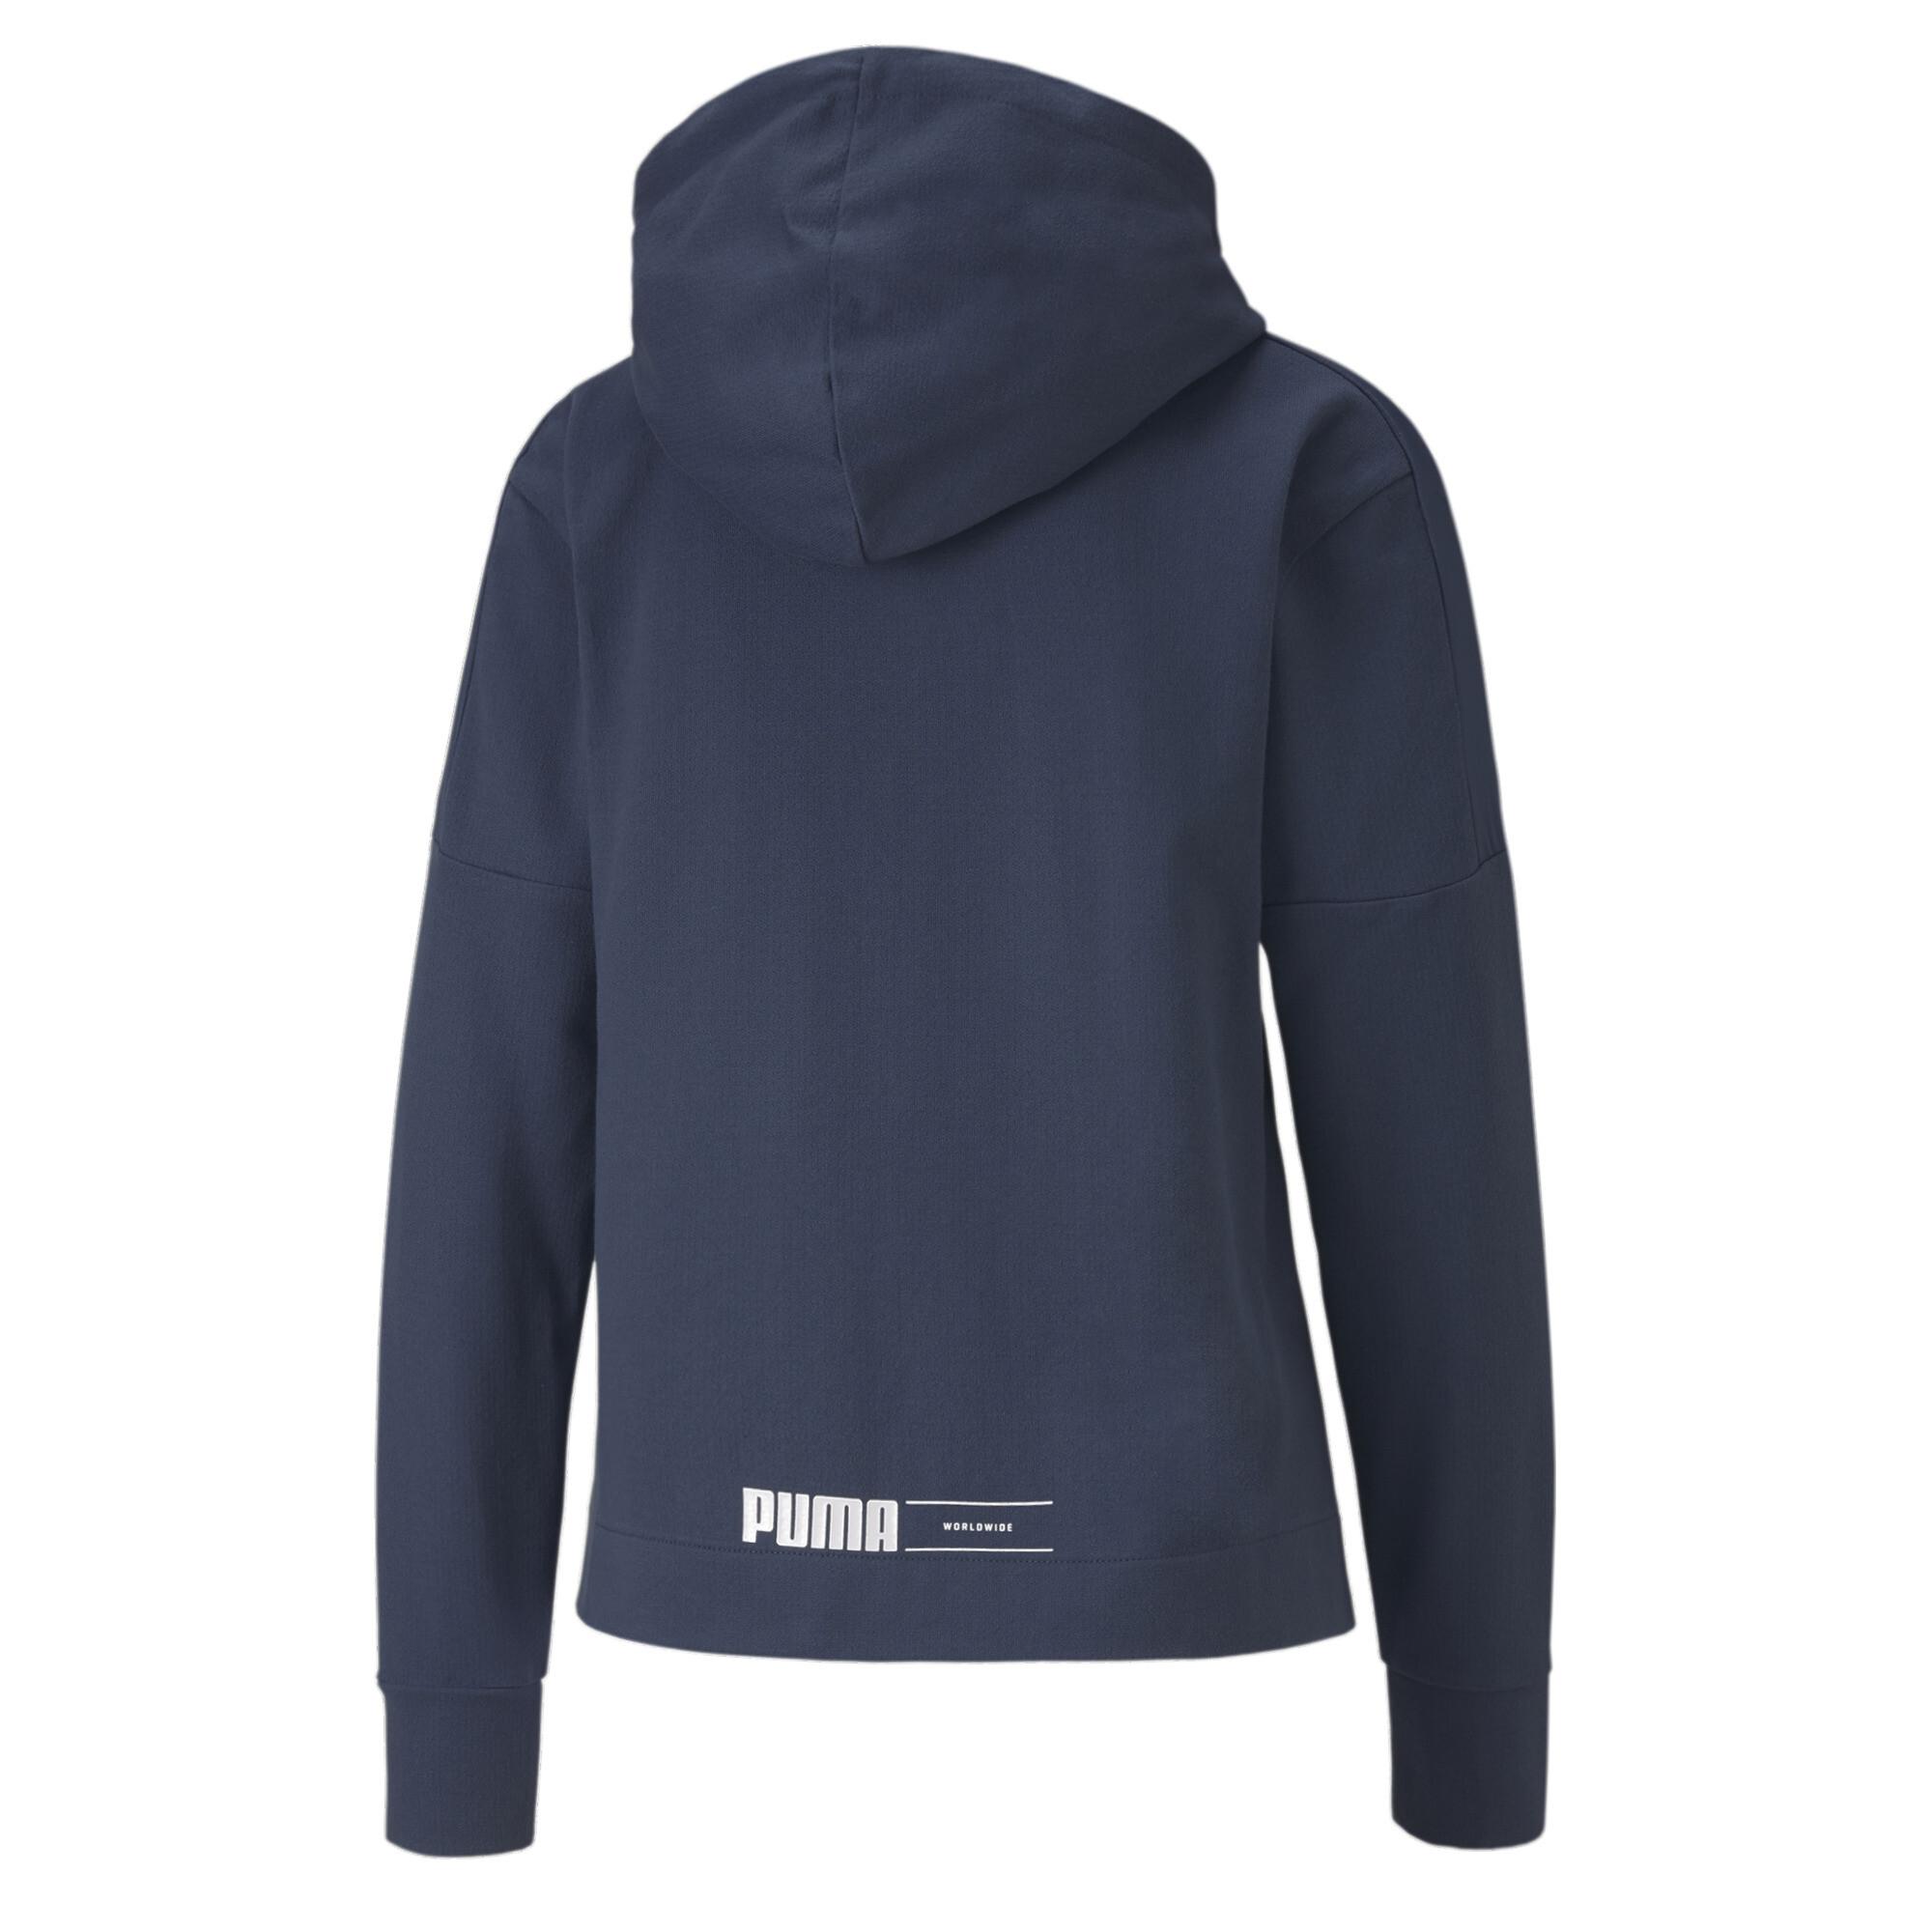 PUMA-NU-TILITY-Women-039-s-Full-Zip-Hoodie-Women-Sweat-Basics miniatuur 3